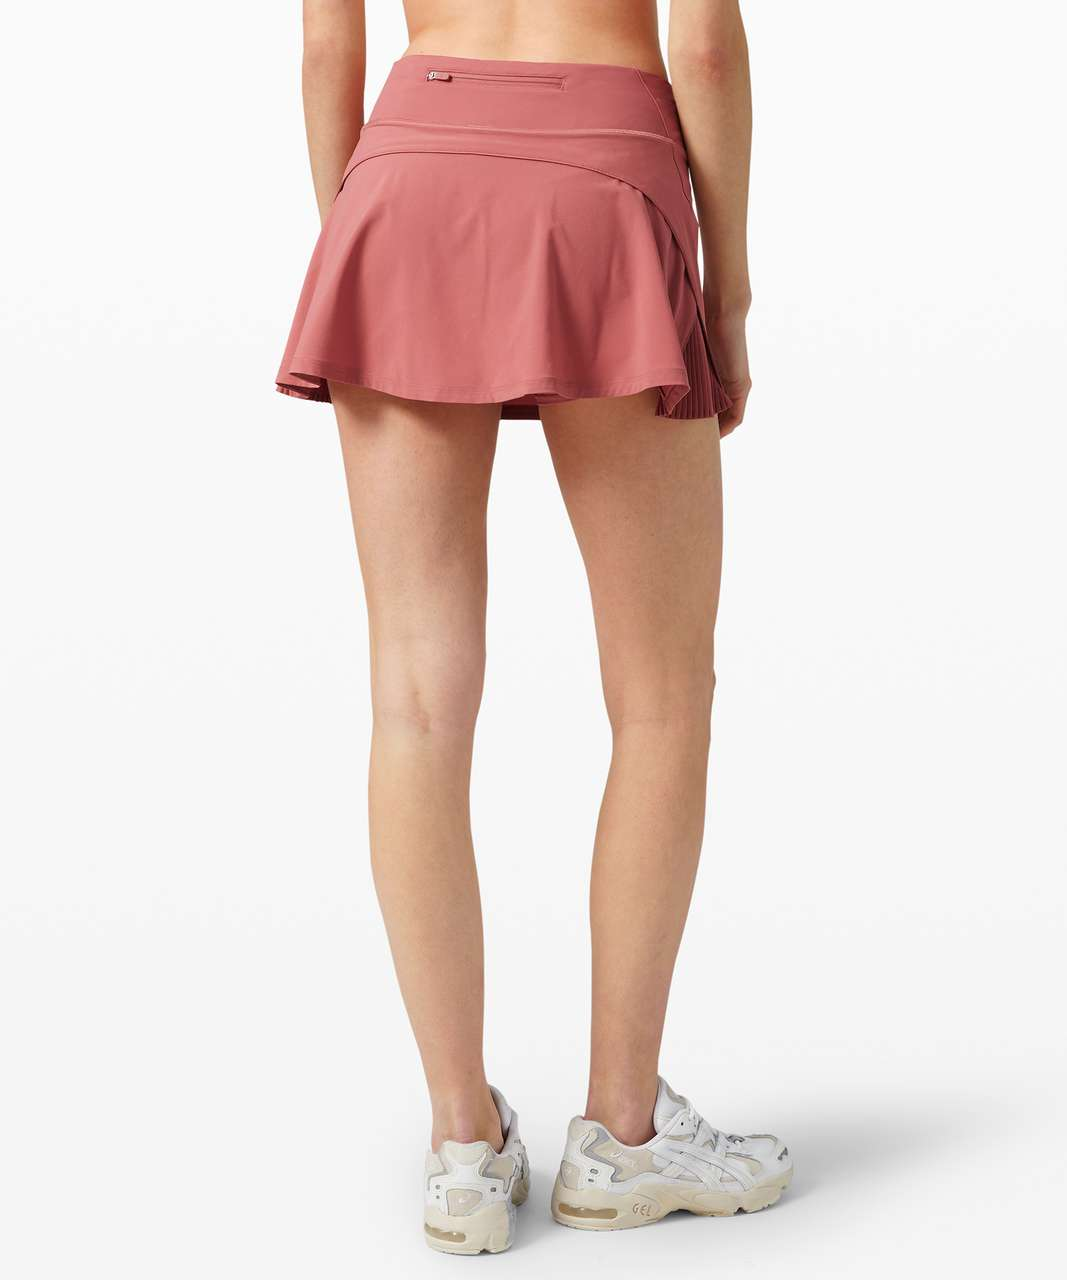 "Lululemon Play Off The Pleats Skirt *13"" - Cherry Tint"